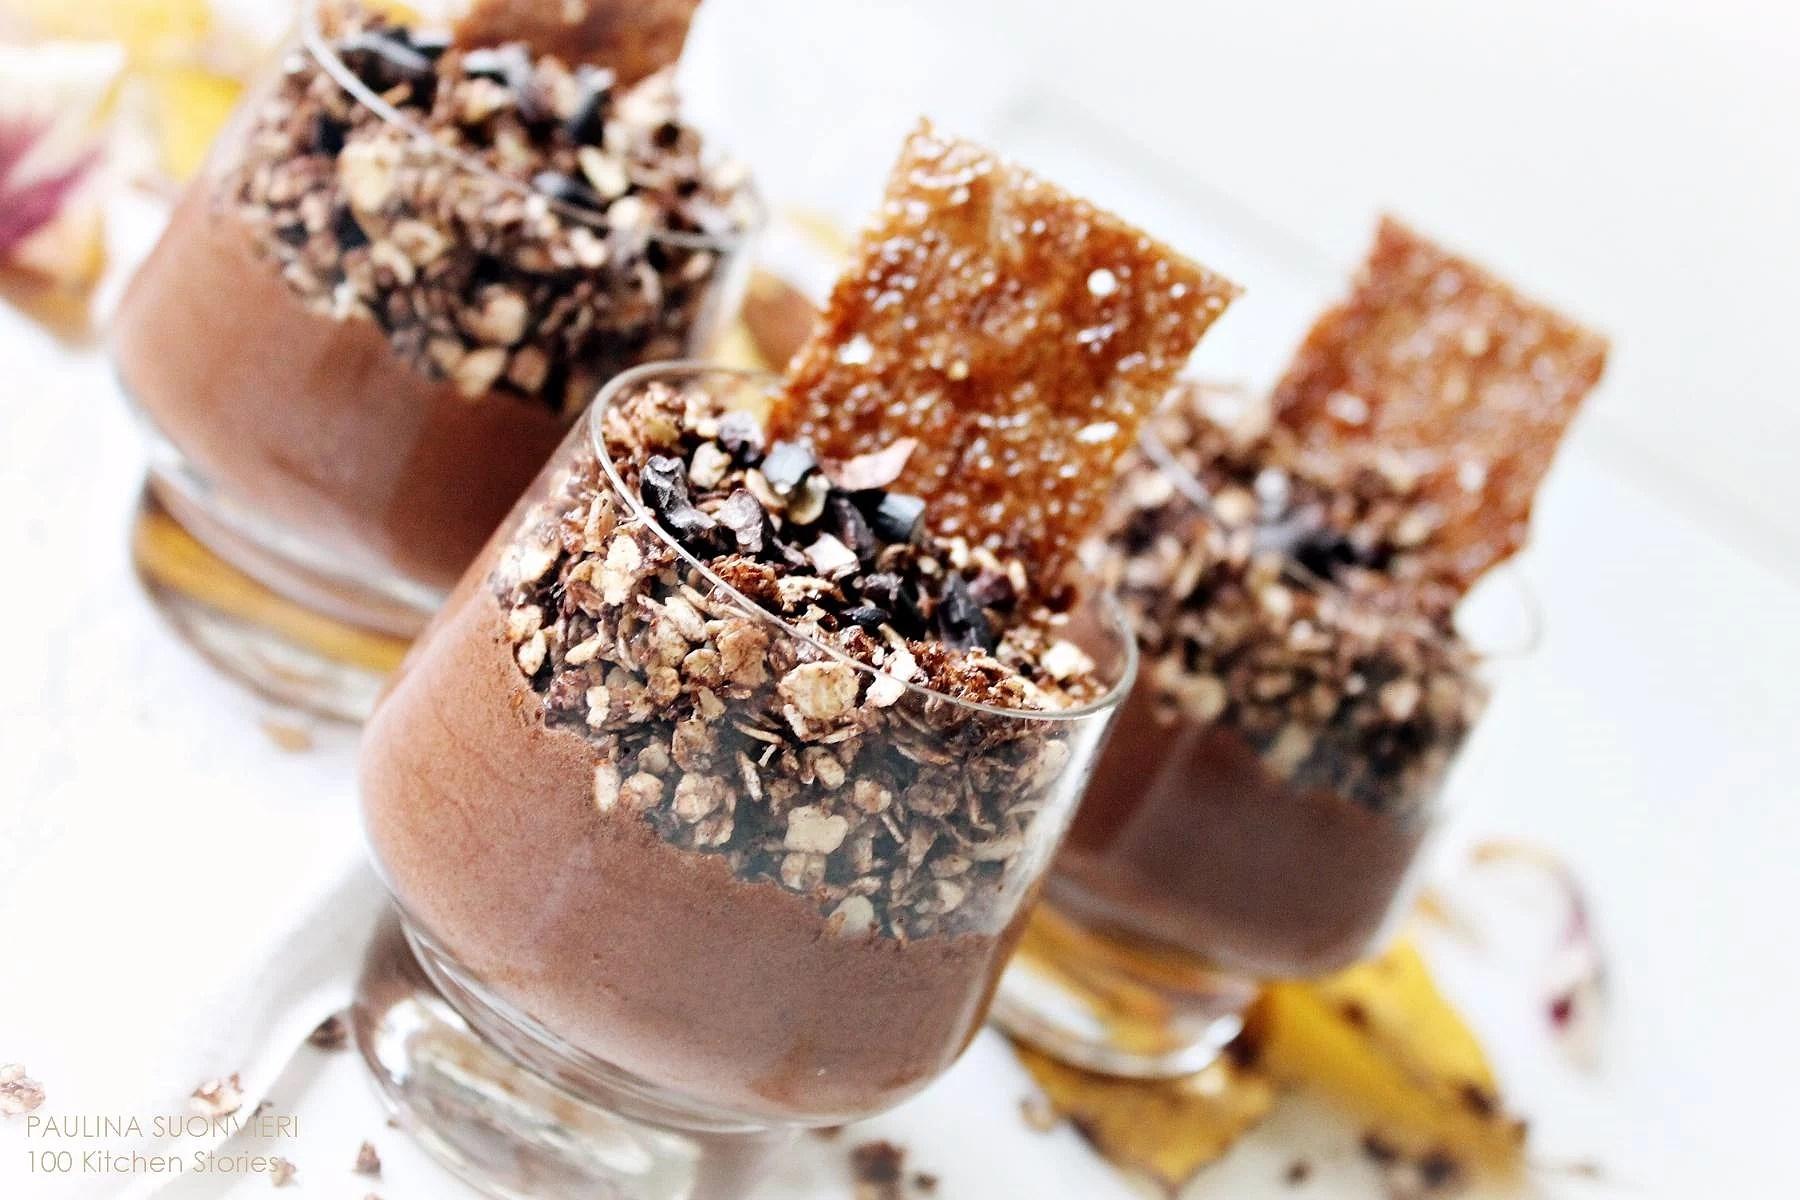 Vegan Choco Cream with Caramelized Oats & Thin Crisp